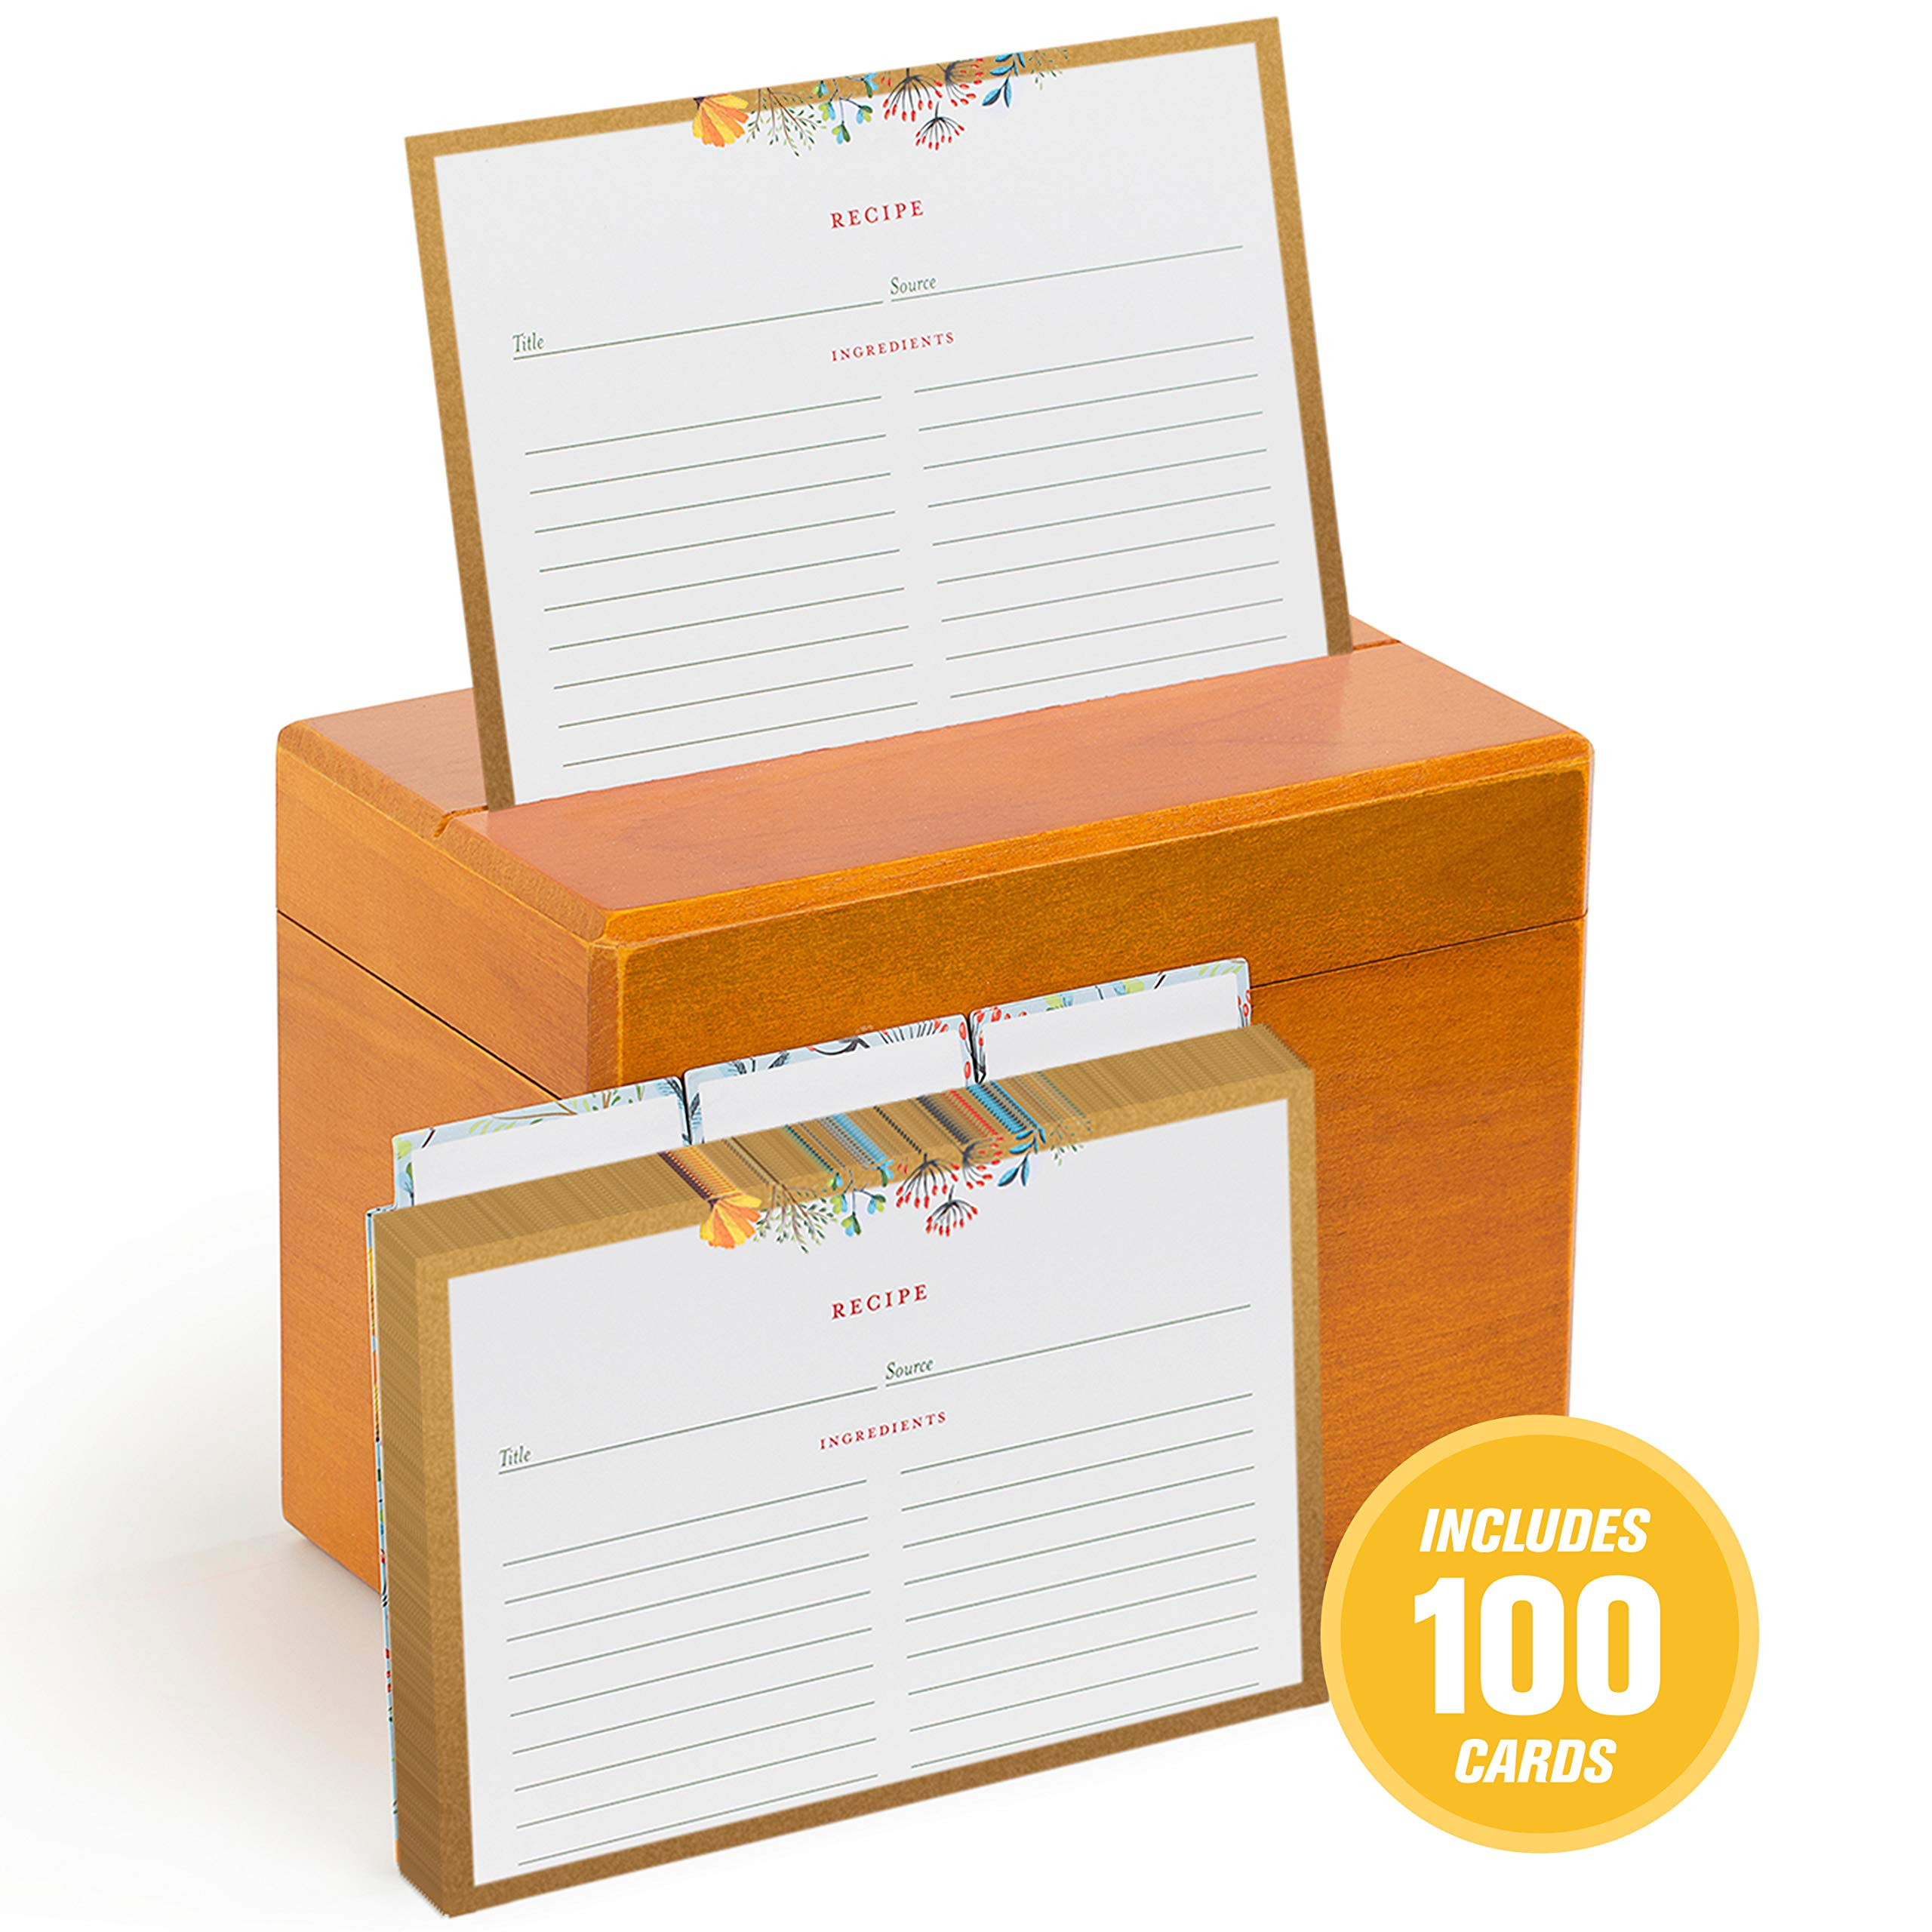 Fresh & Lucky Recipe Box with 100 Recipe Cards - 4x6 Recipe Cards with Dividers - Floral Recipe Cards with Gold Border